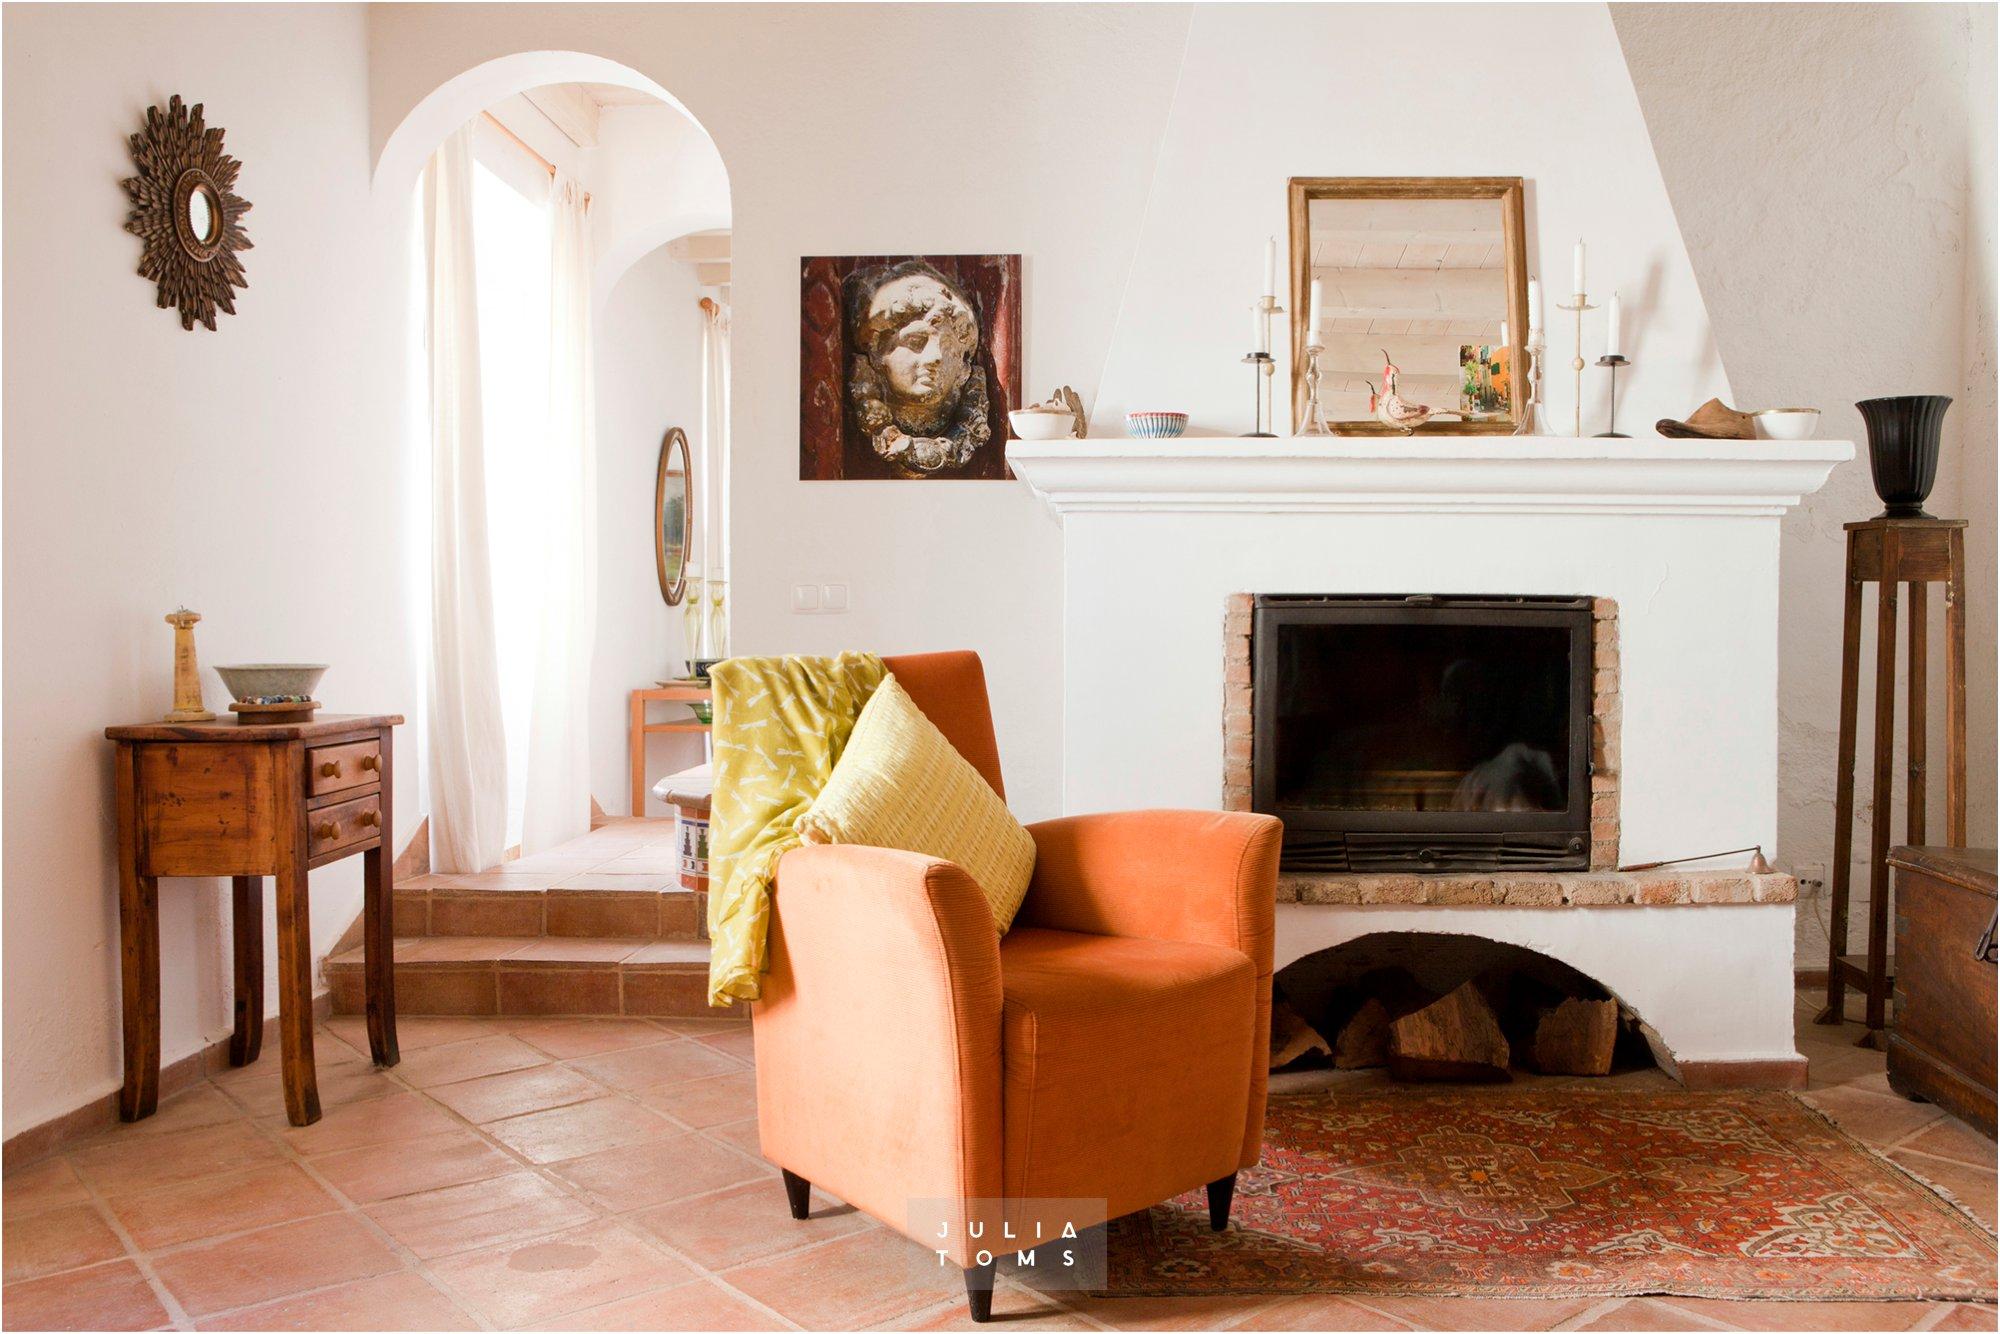 julia_toms_photography_interiors_magazine_005.jpg